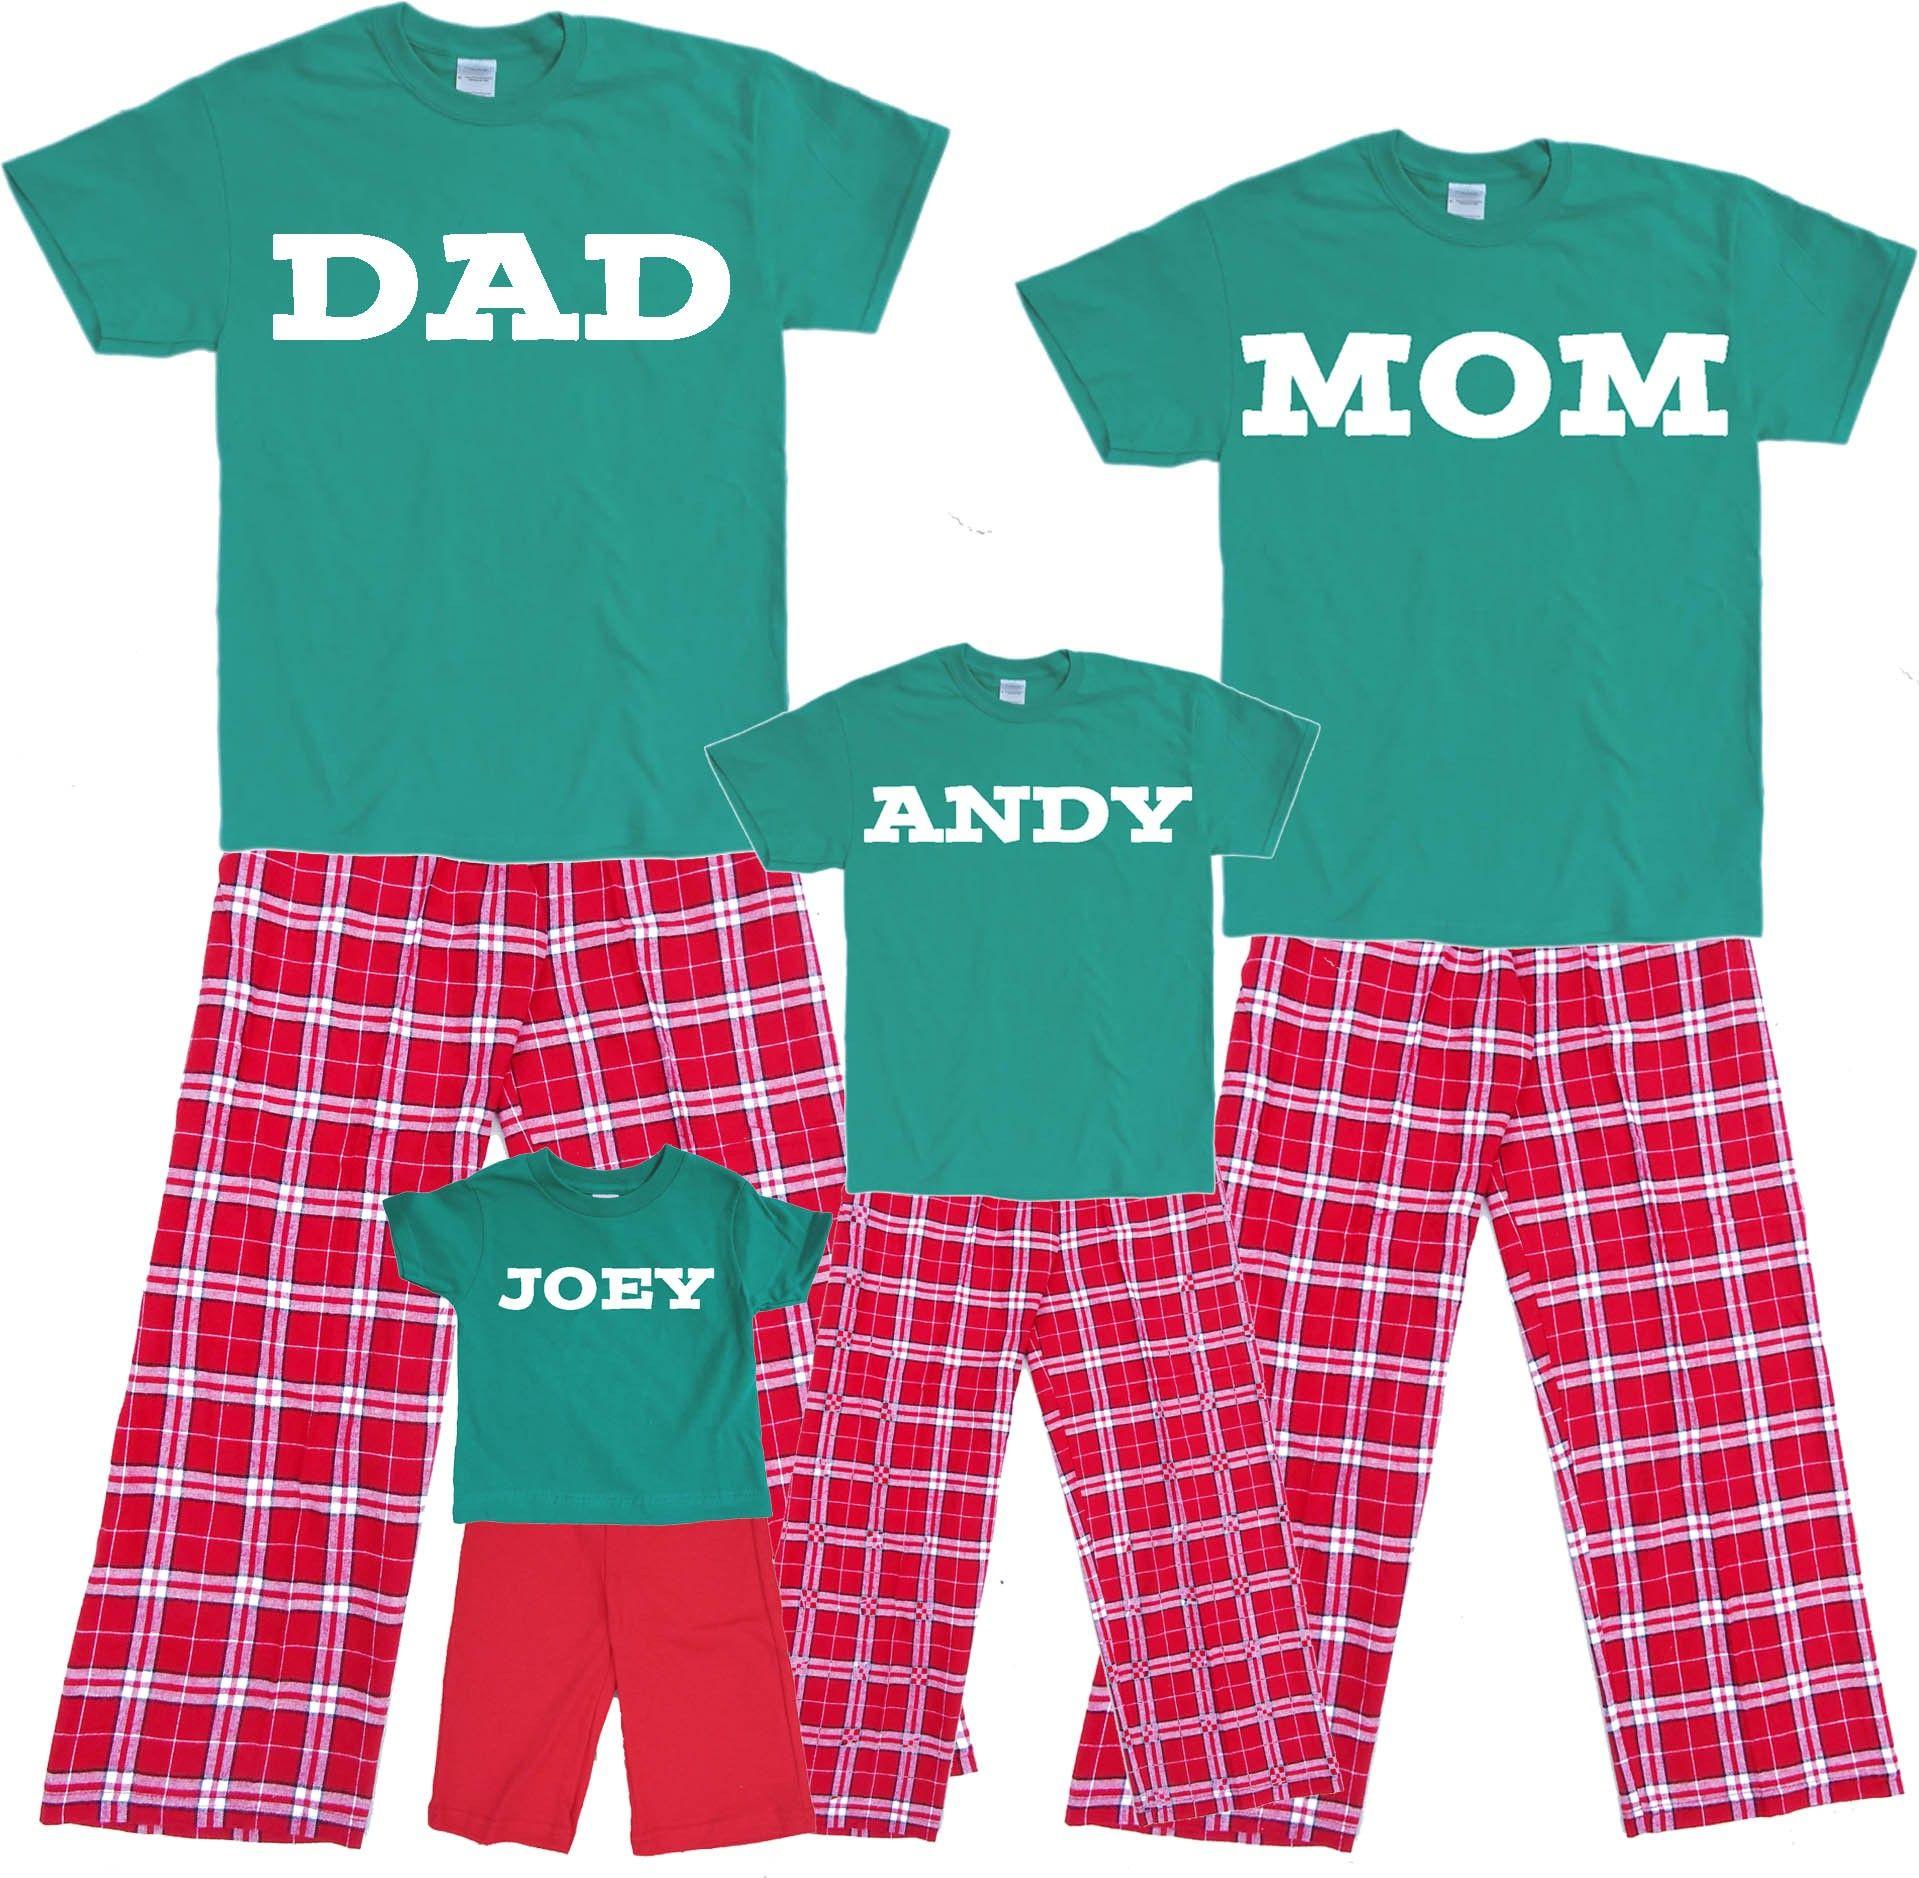 family christian pajamas | Christmas Pajamas for Family - Adult ...